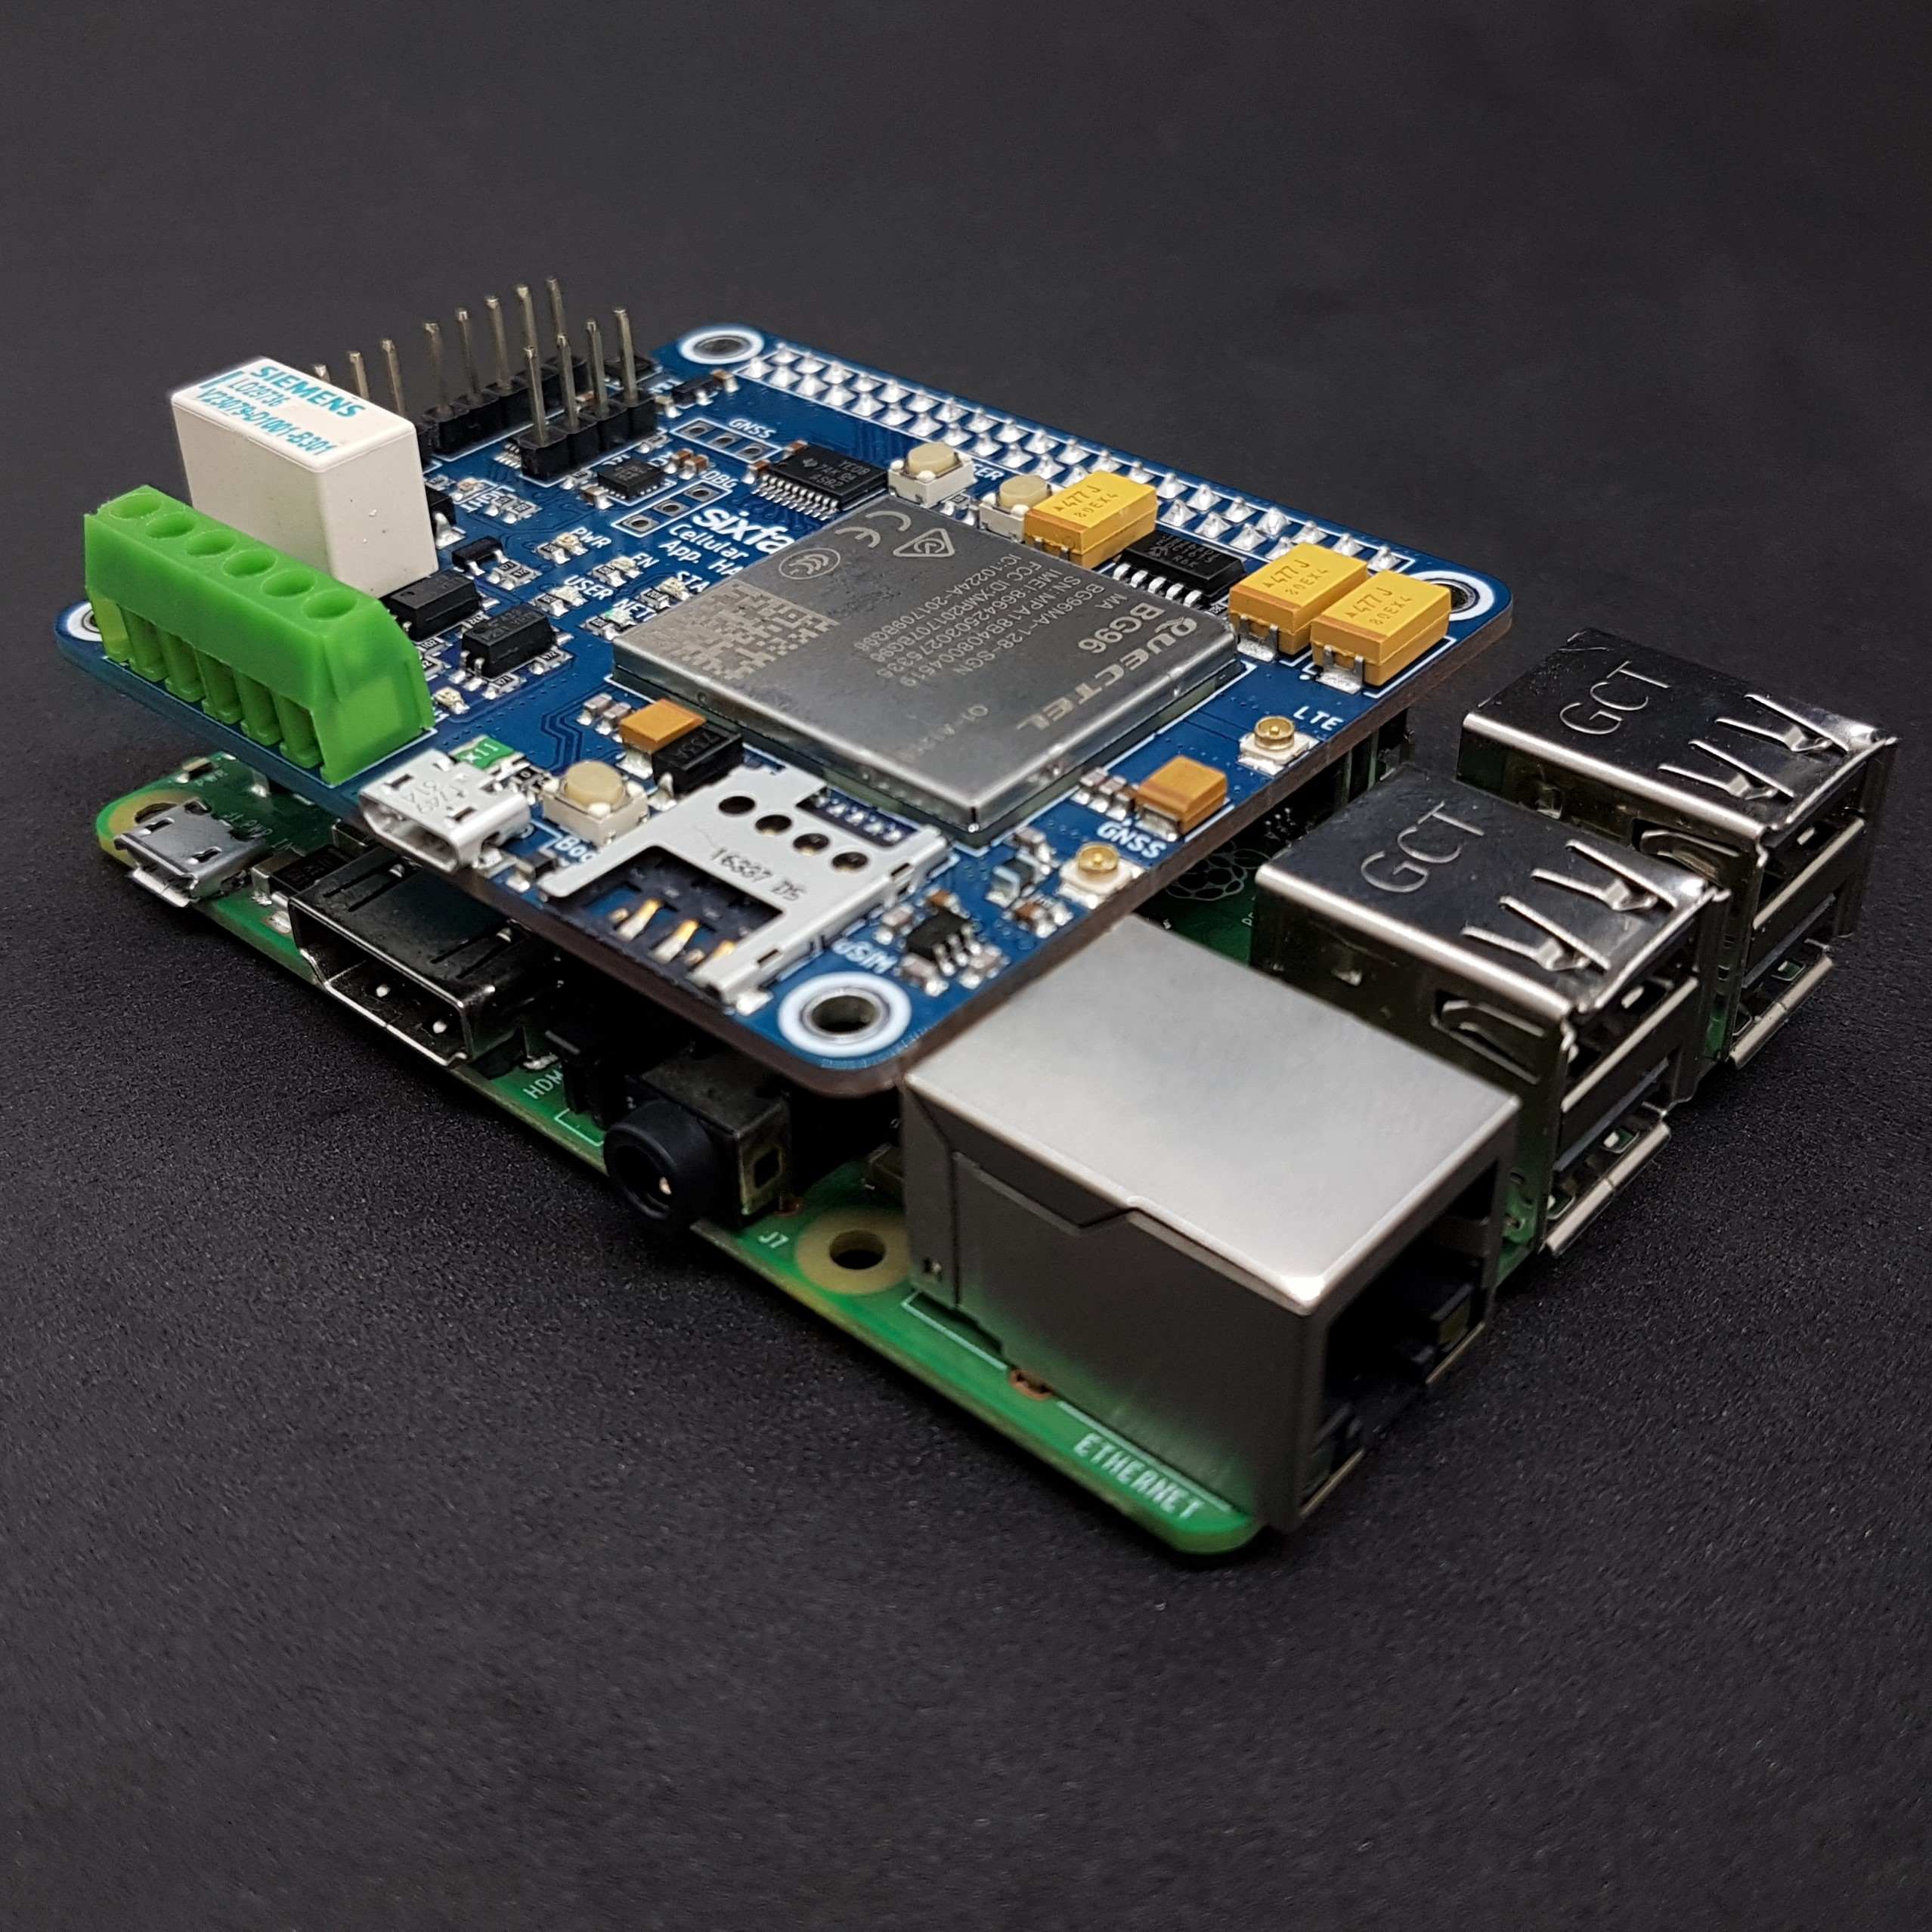 Raspberry Pi Cellular IoT Application Shield – LTE-M & NB-IoT & eGPRS